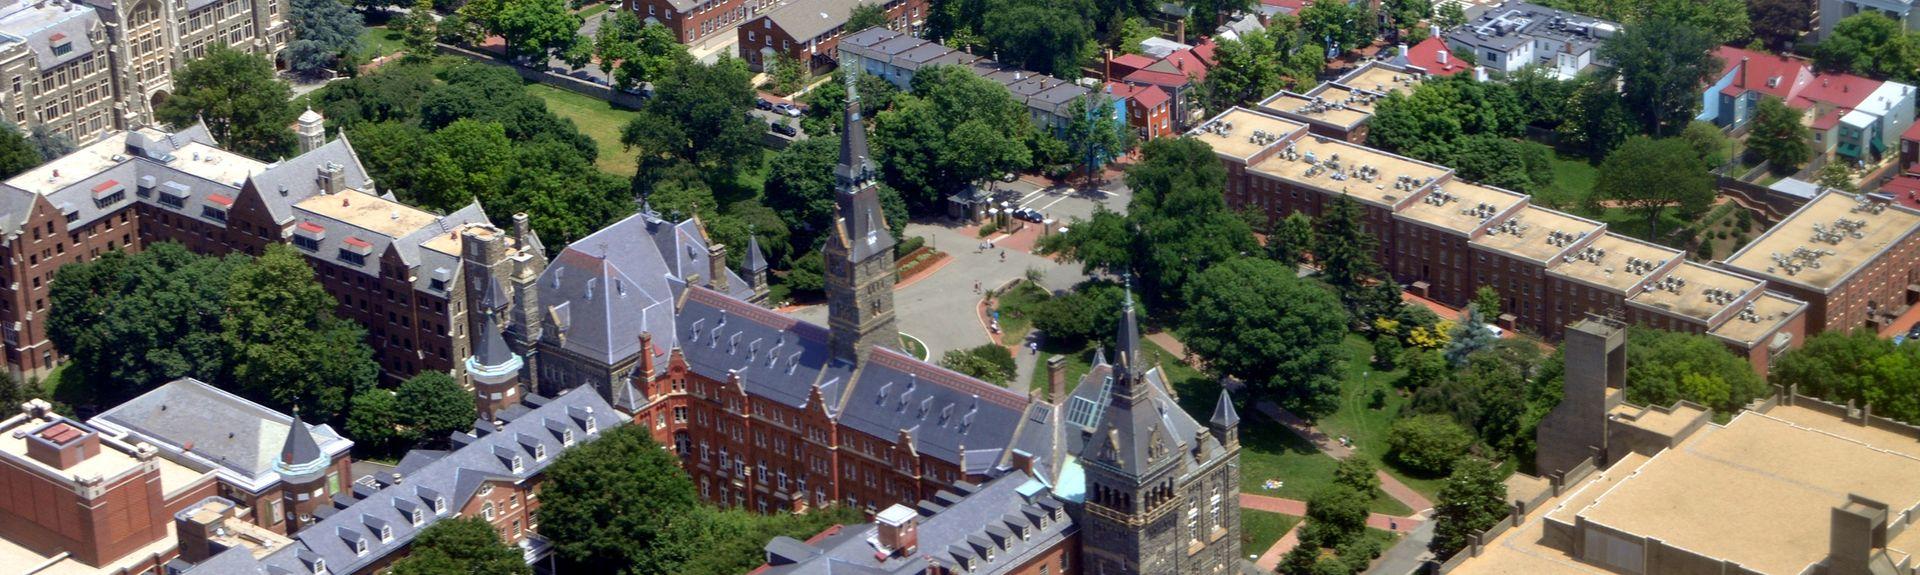 Georgetown, Washington, District of Columbia, USA